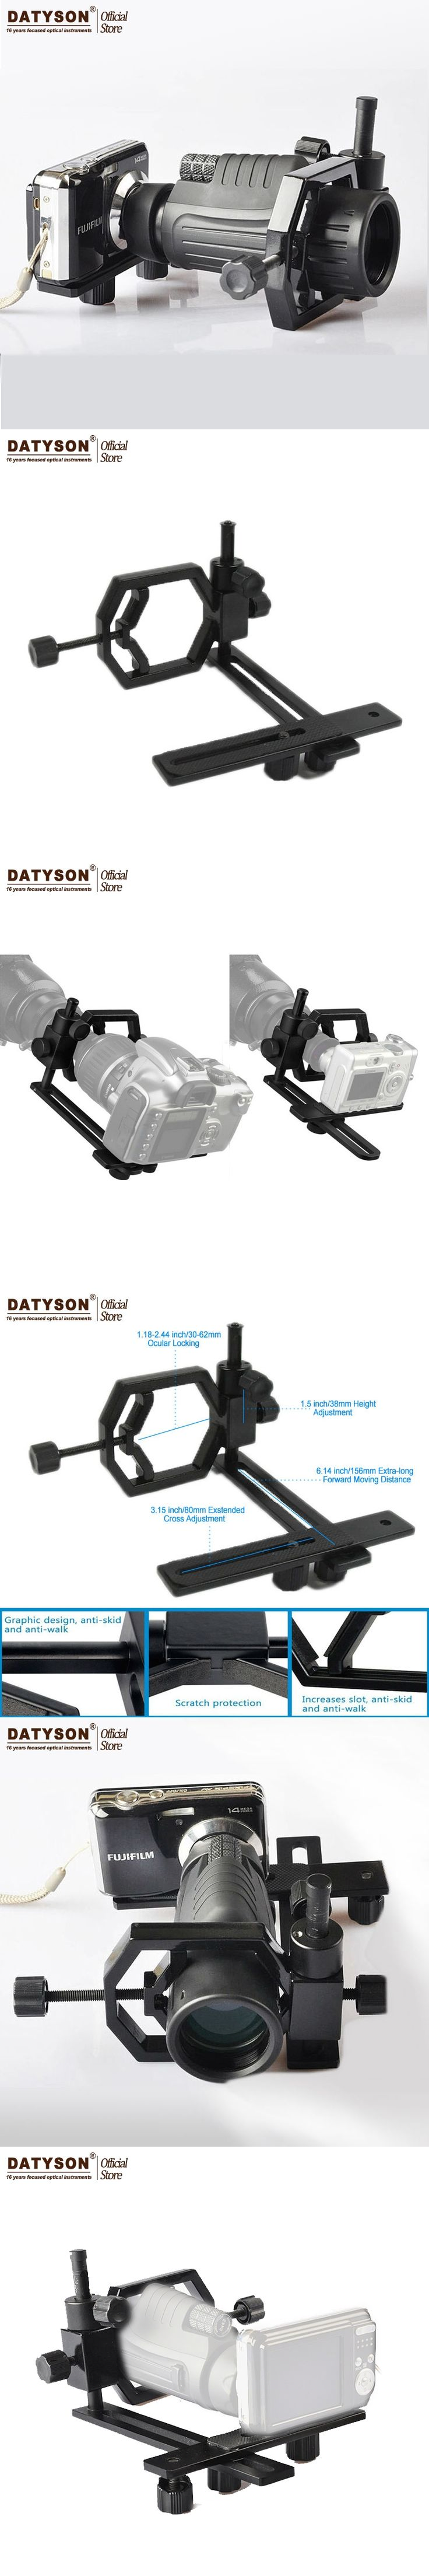 Datyson Fully Metal Telescope Camera Mount Adapter for Telescope Microscope Binocular Spotting Scope Monocular Point-and-shoot